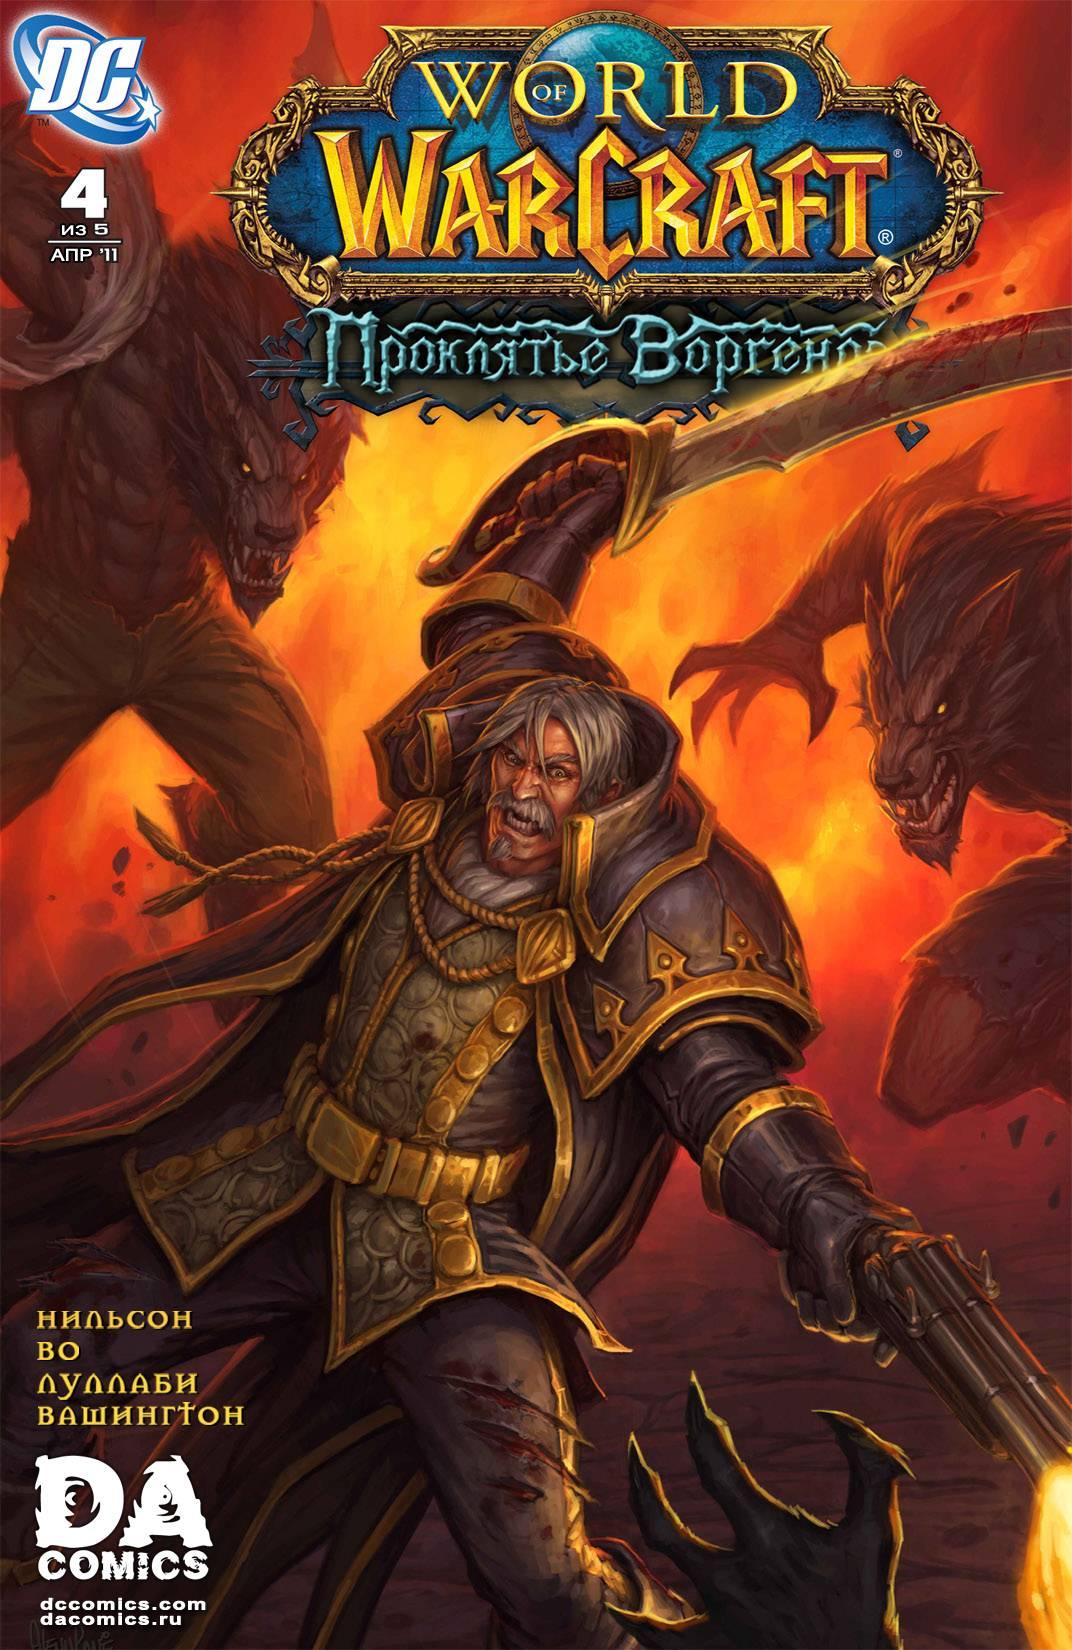 World of Warcraft: Проклятье Воргенов №4 онлайн